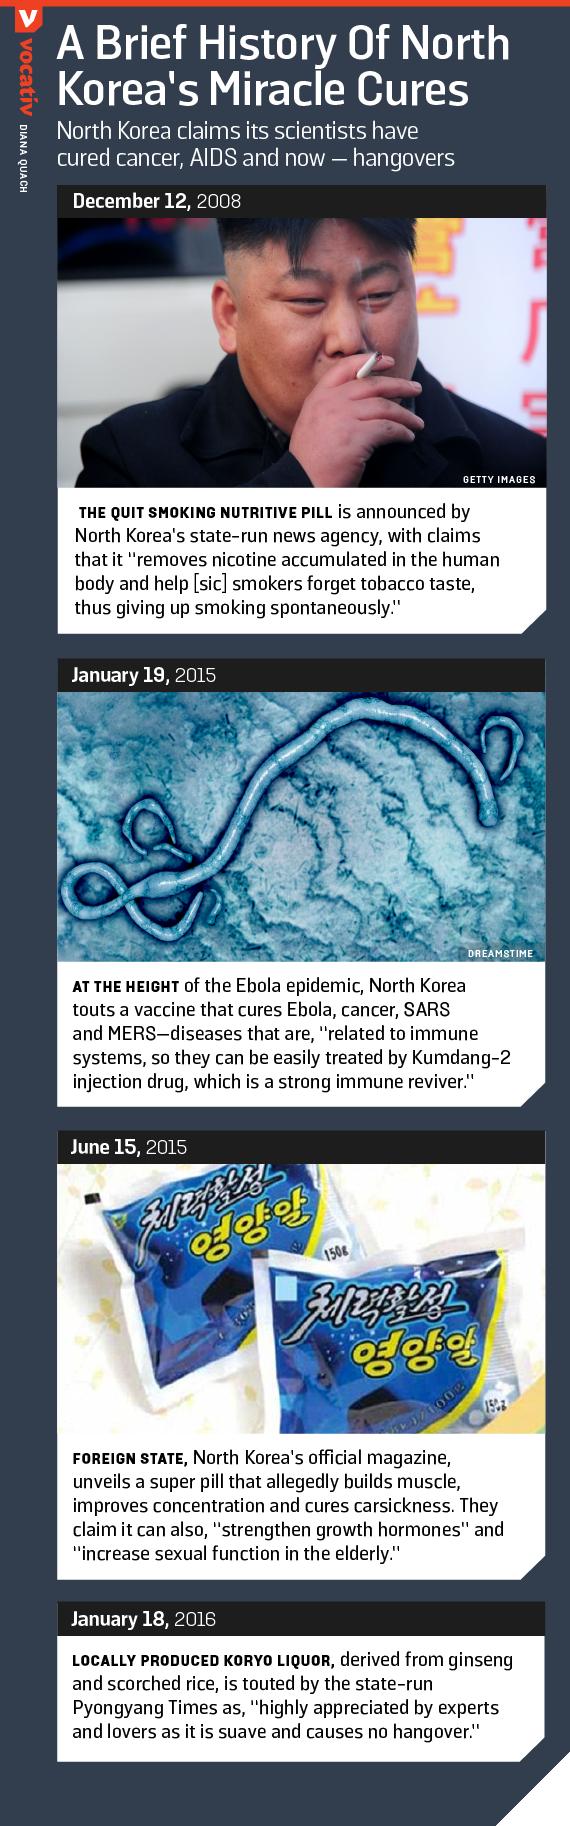 2016_01_19 North Korea MiracleCures BHO 1